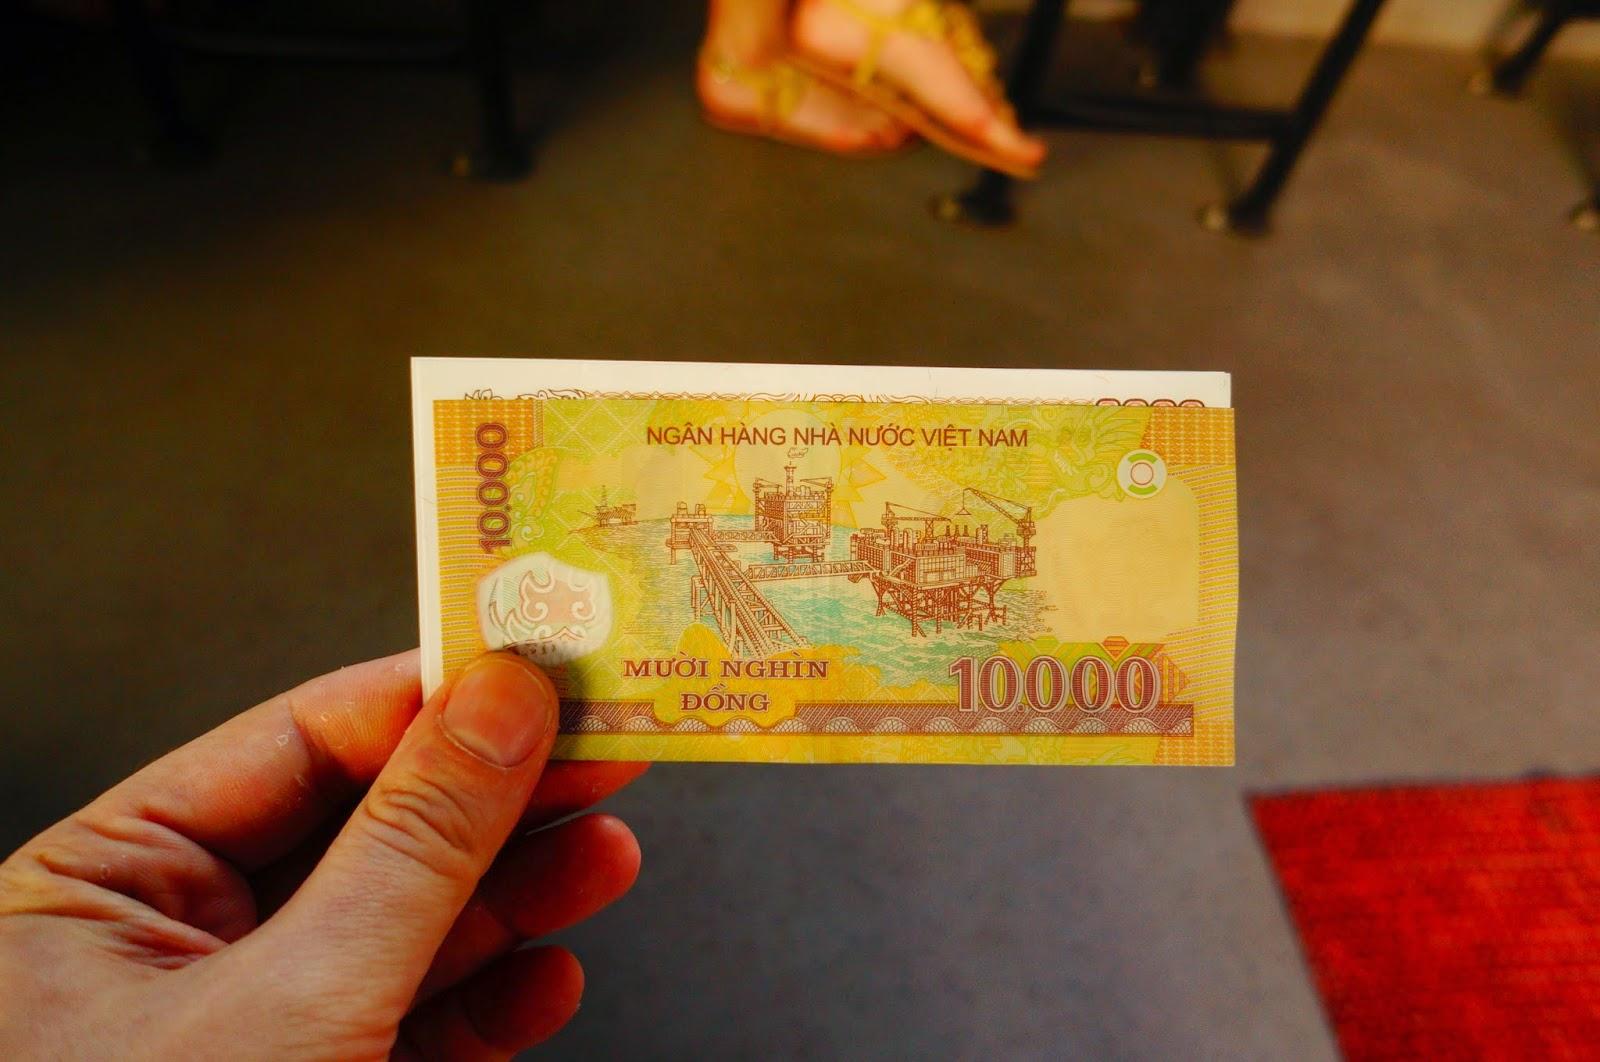 Dong-10000